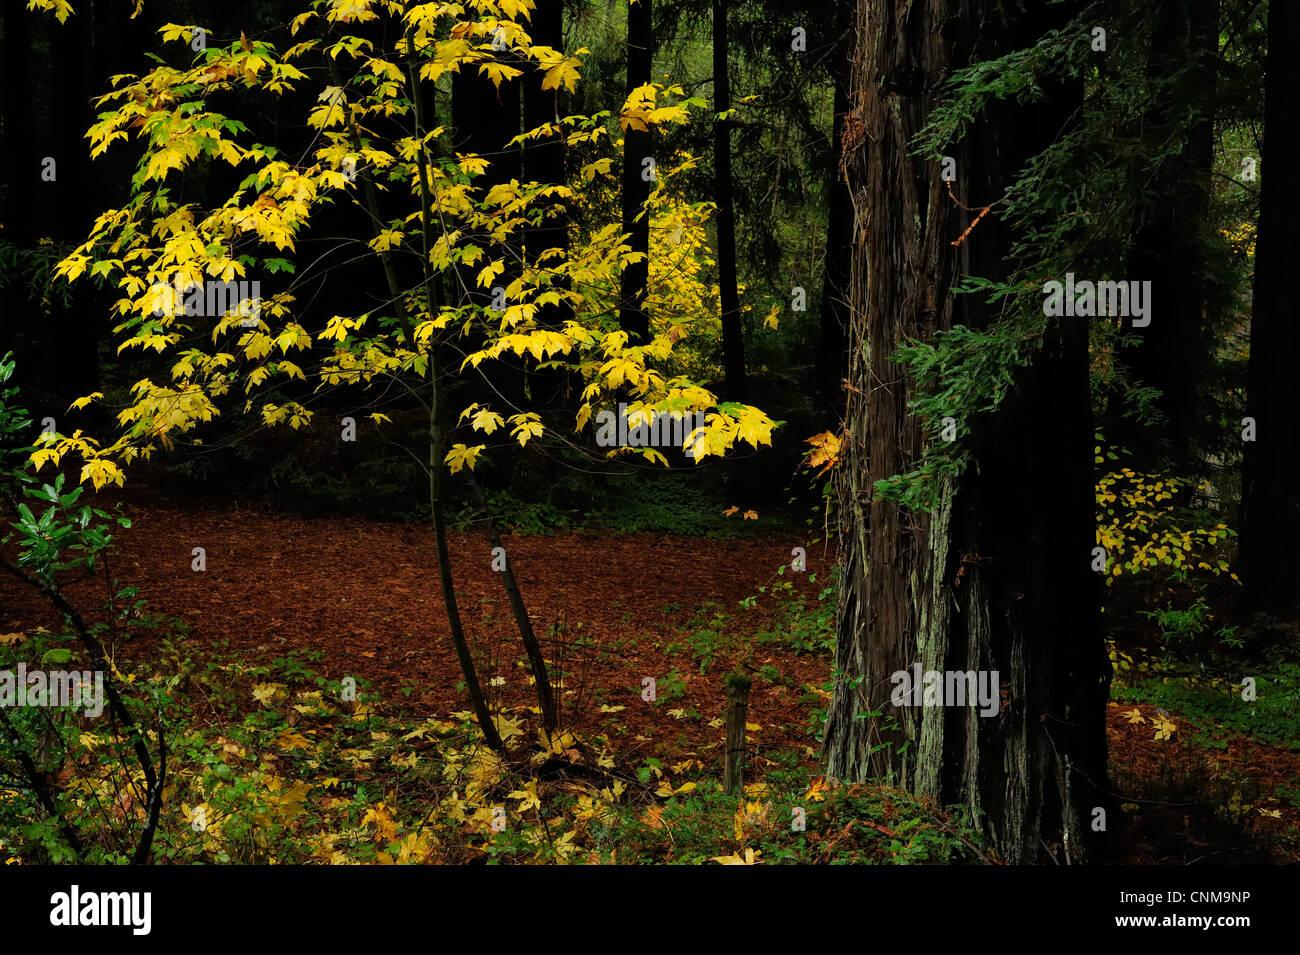 Redwood and Big Leaf Maple in Fall, near La Honda, CA Stock Photo